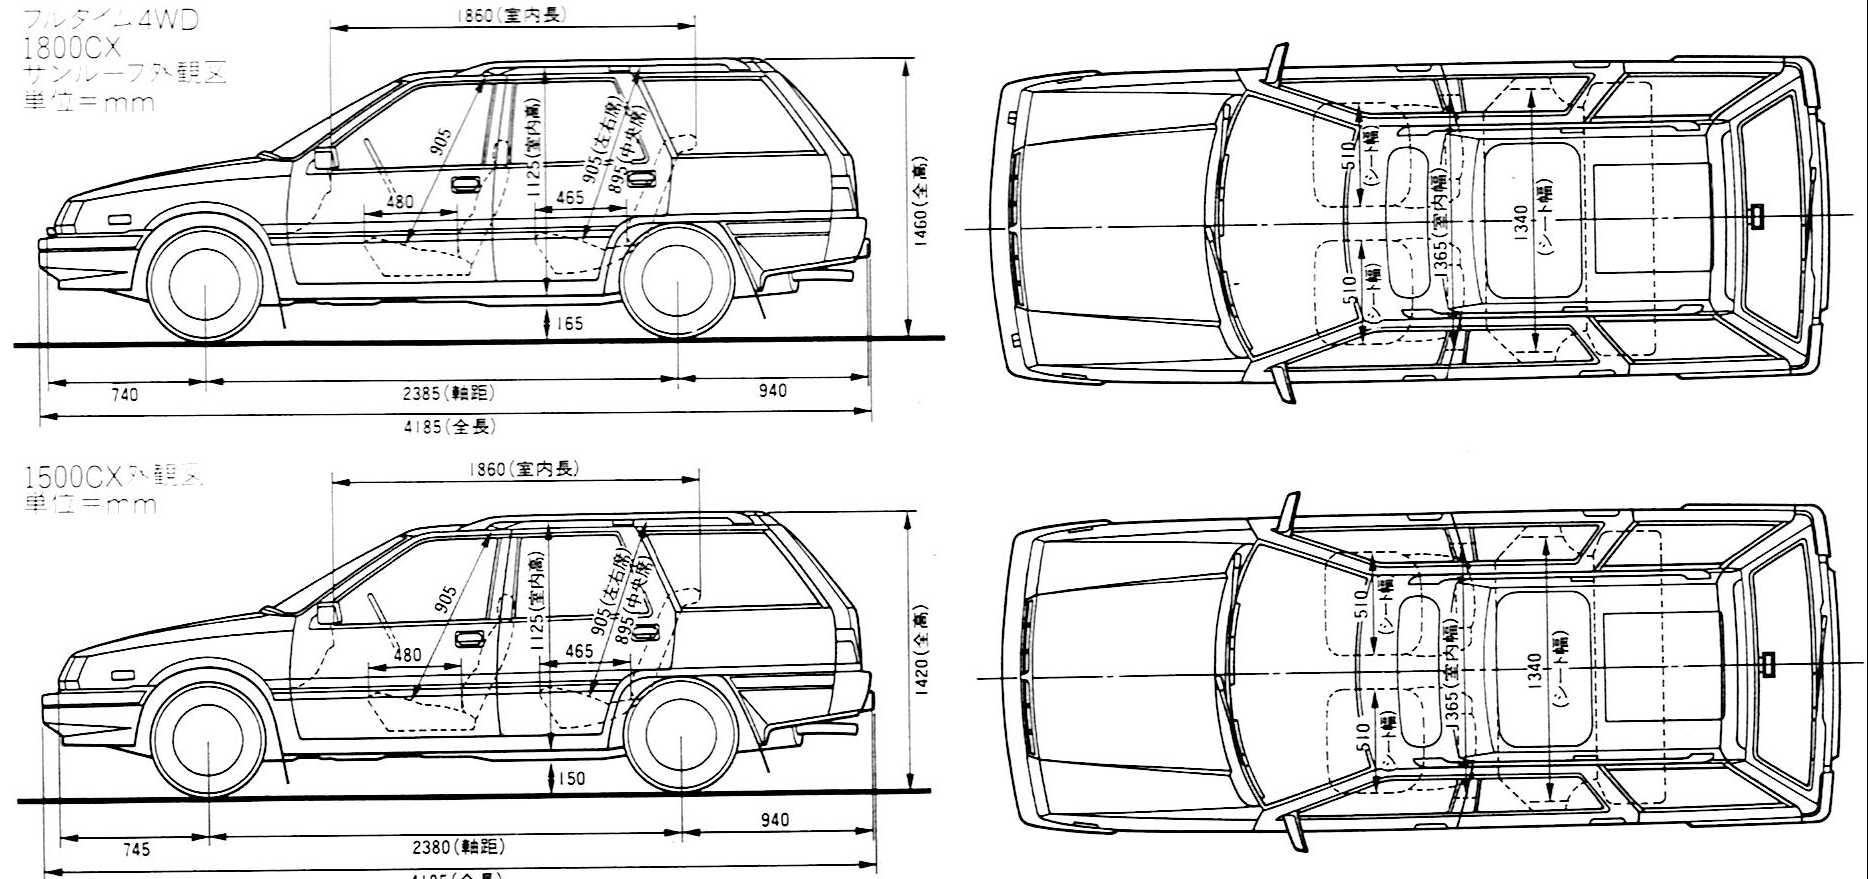 Ausgezeichnet Blueprint Datenbank Fotos - Schaltplan Serie Circuit ...